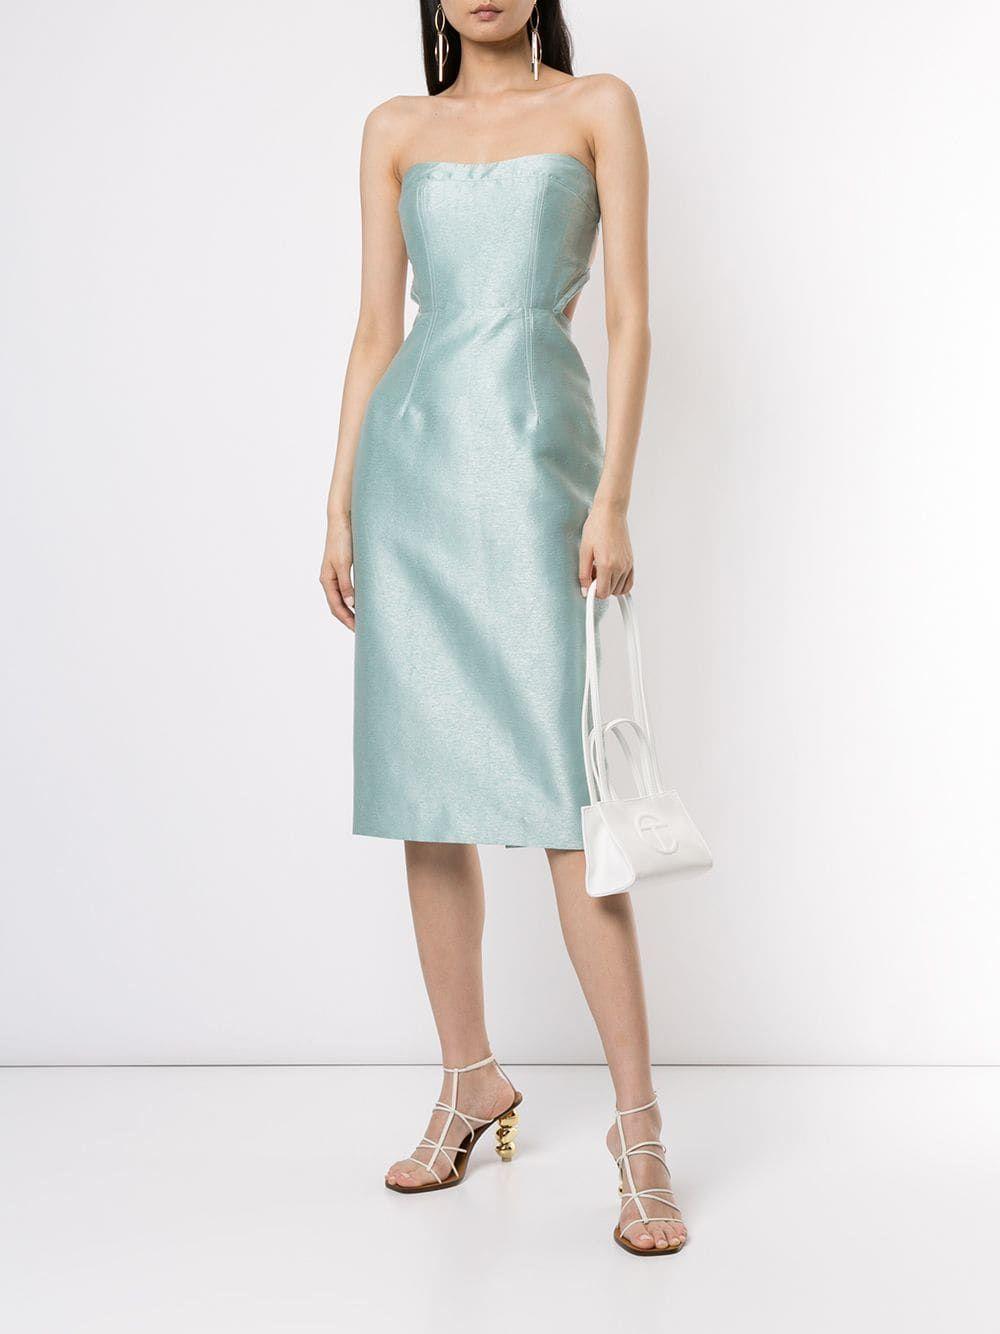 Manning Cartell Strapless Midi Dress Farfetch Dresses Strapless Midi Dress Midi Dress [ 1334 x 1000 Pixel ]